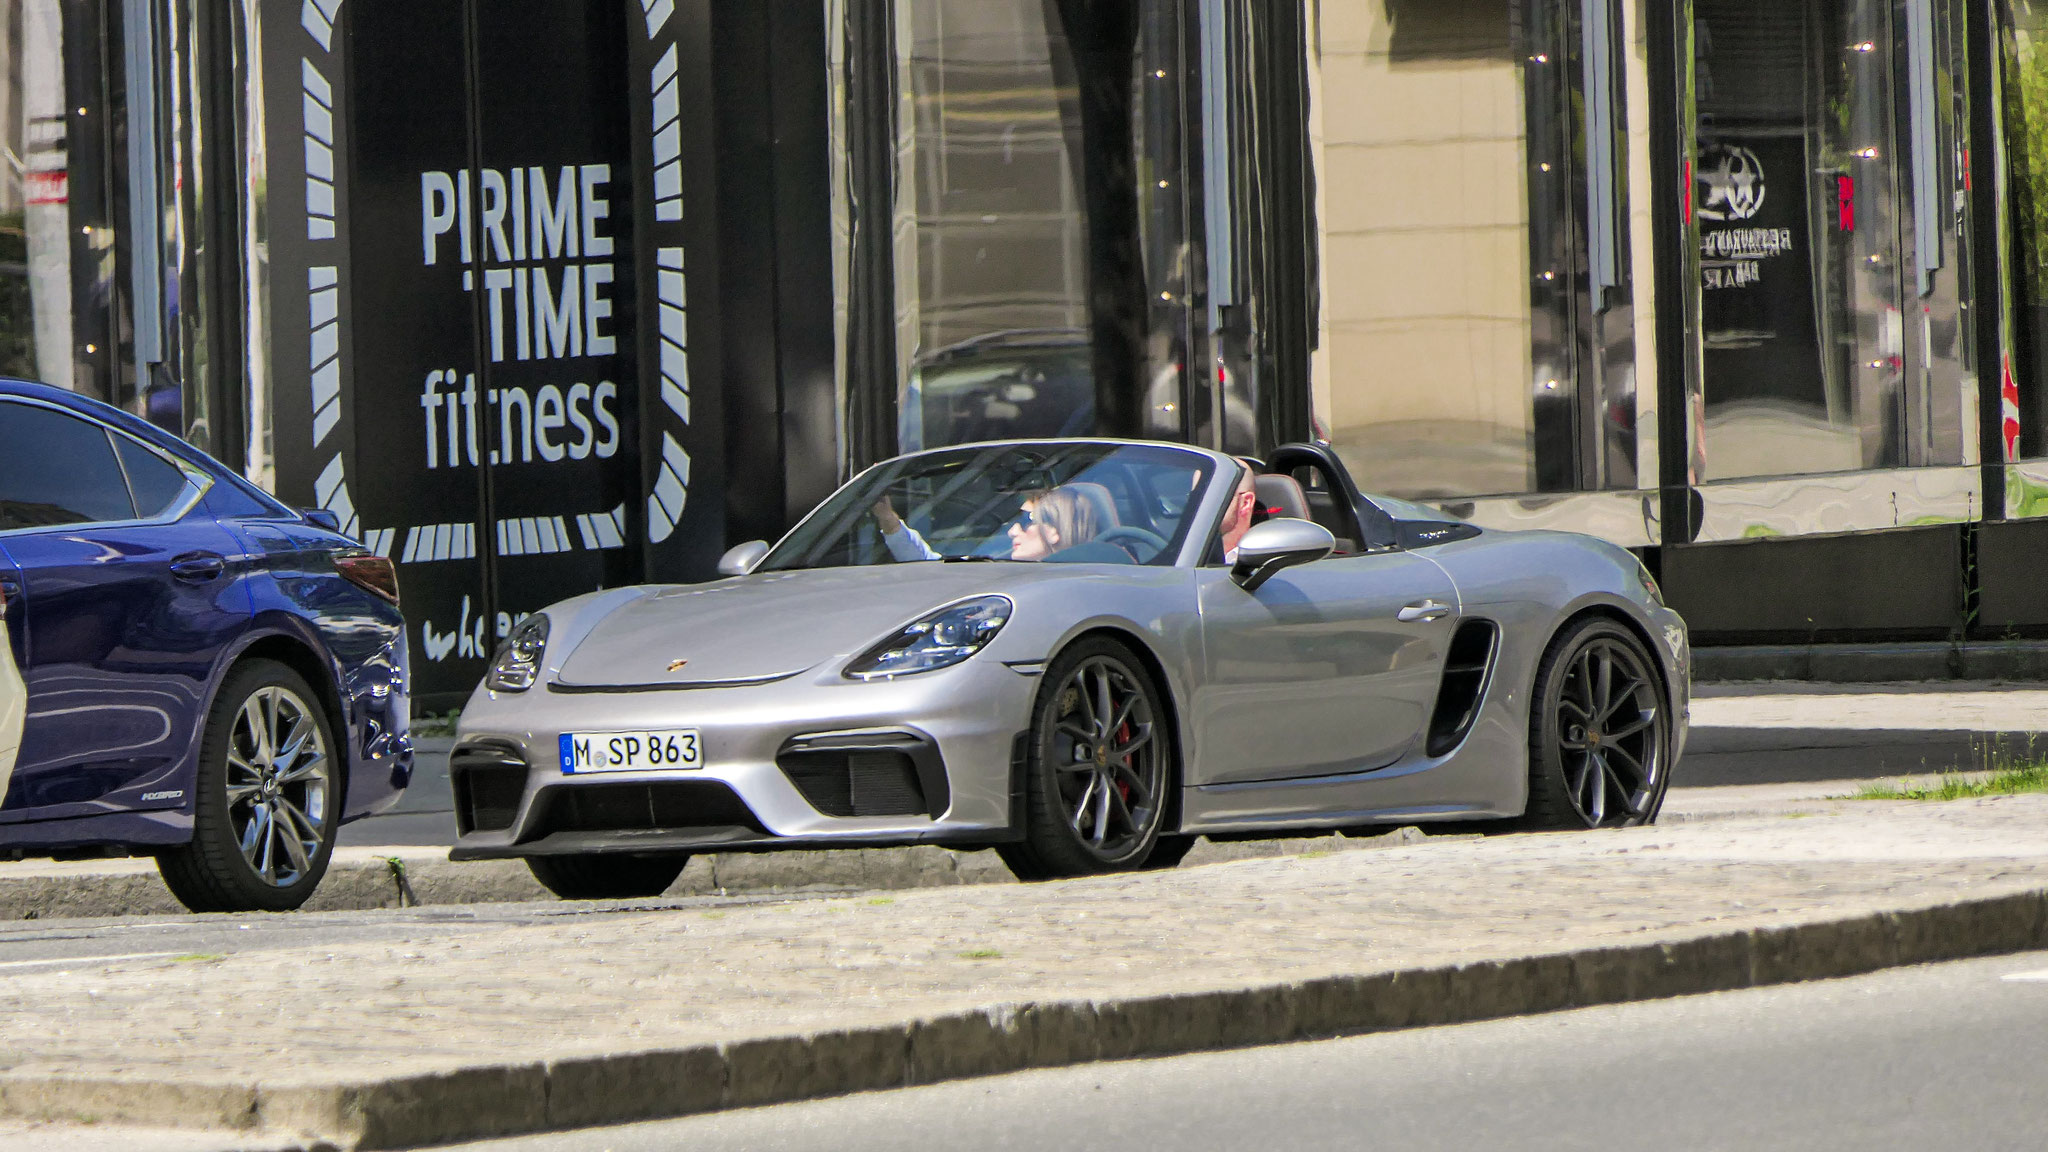 Porsche 718 Spyder - M-SP-683